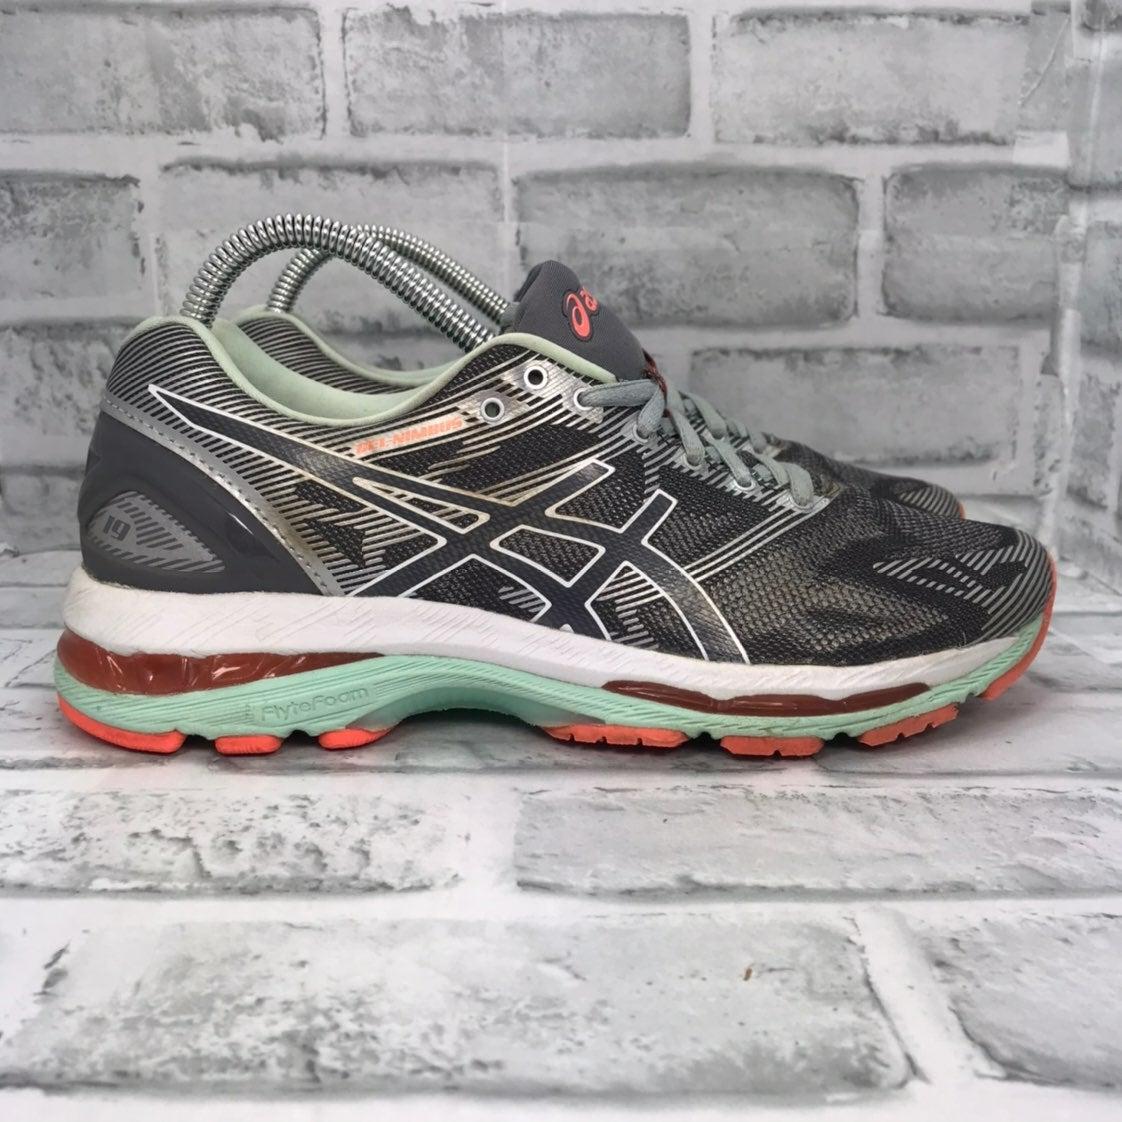 ASICS Gel Nimbus 19 Athletic Shoes